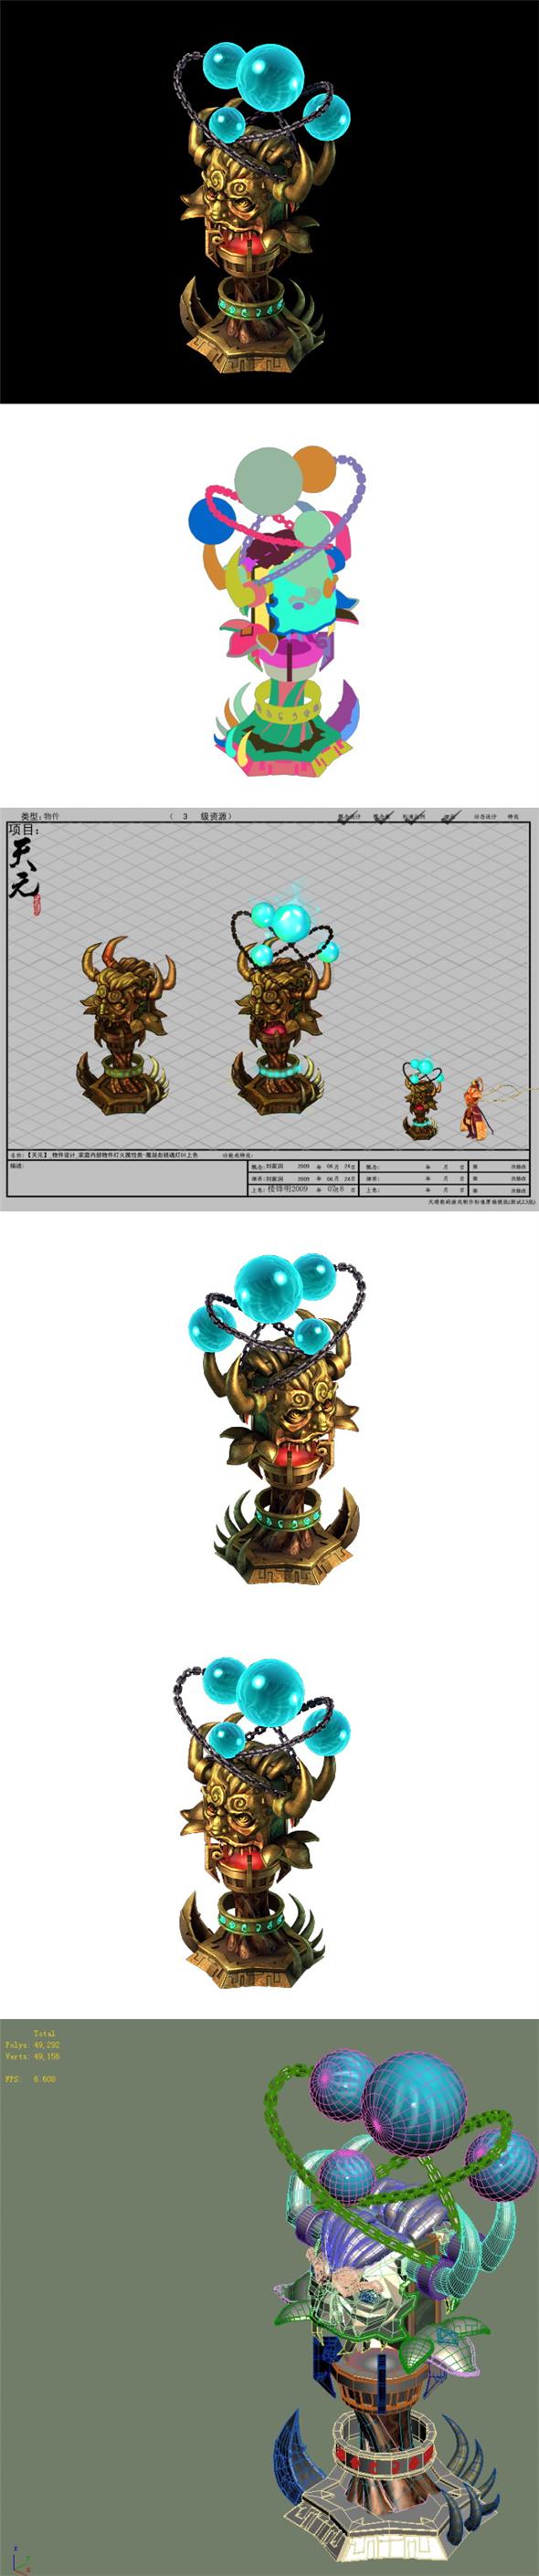 Game Model - Family Objects - Magic Coagulation Soul Lights 01 - 3DOcean Item for Sale